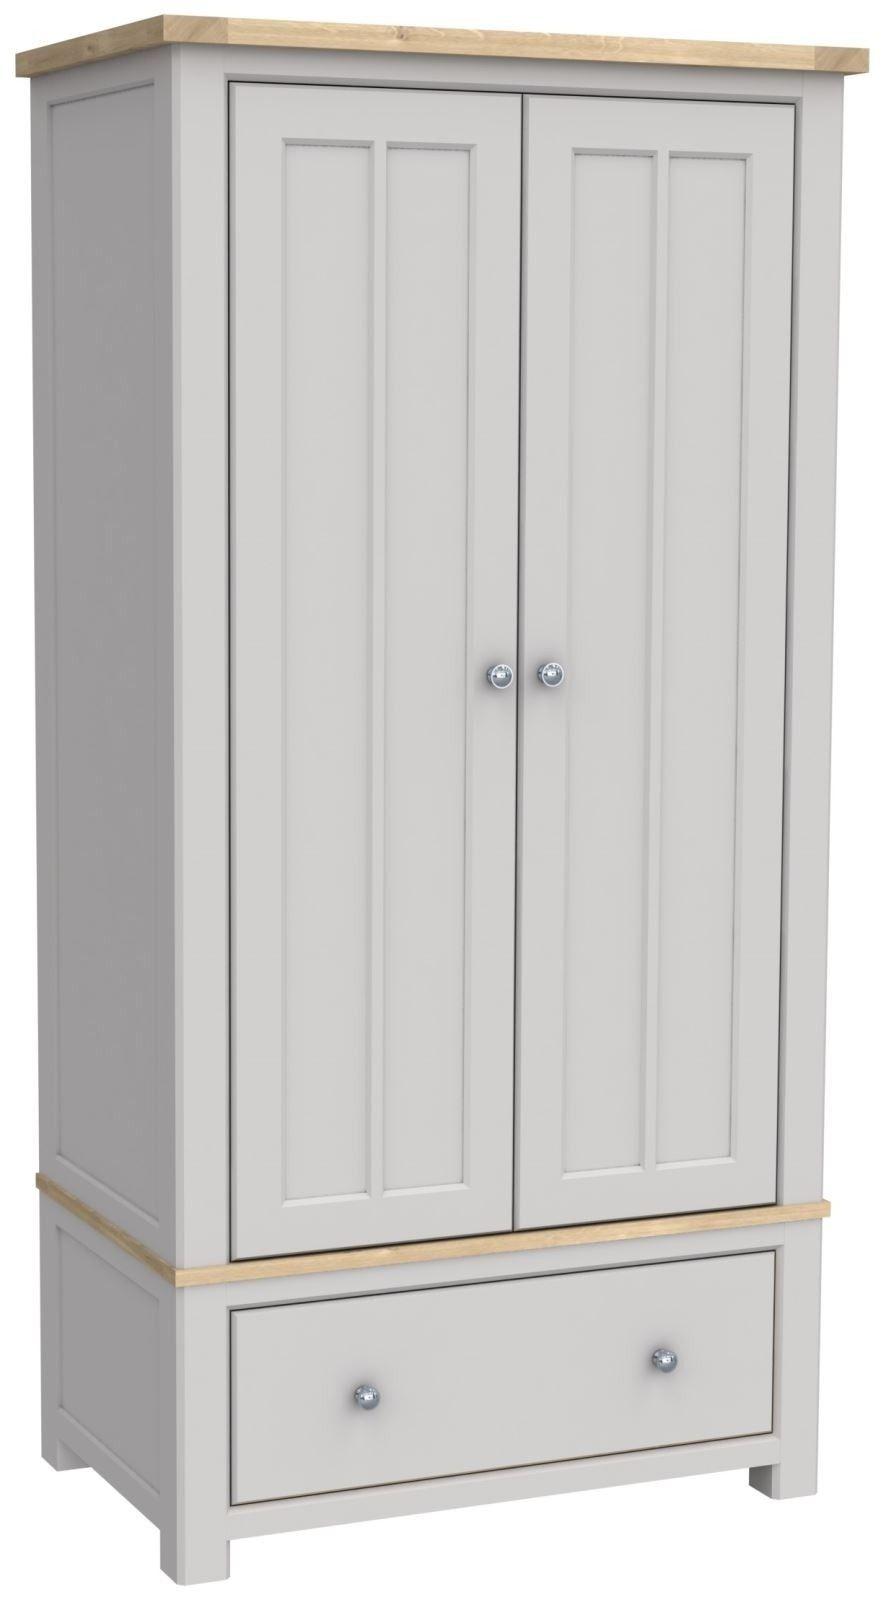 Brittany Oak 2 Door 1 Drawer Wardrobe